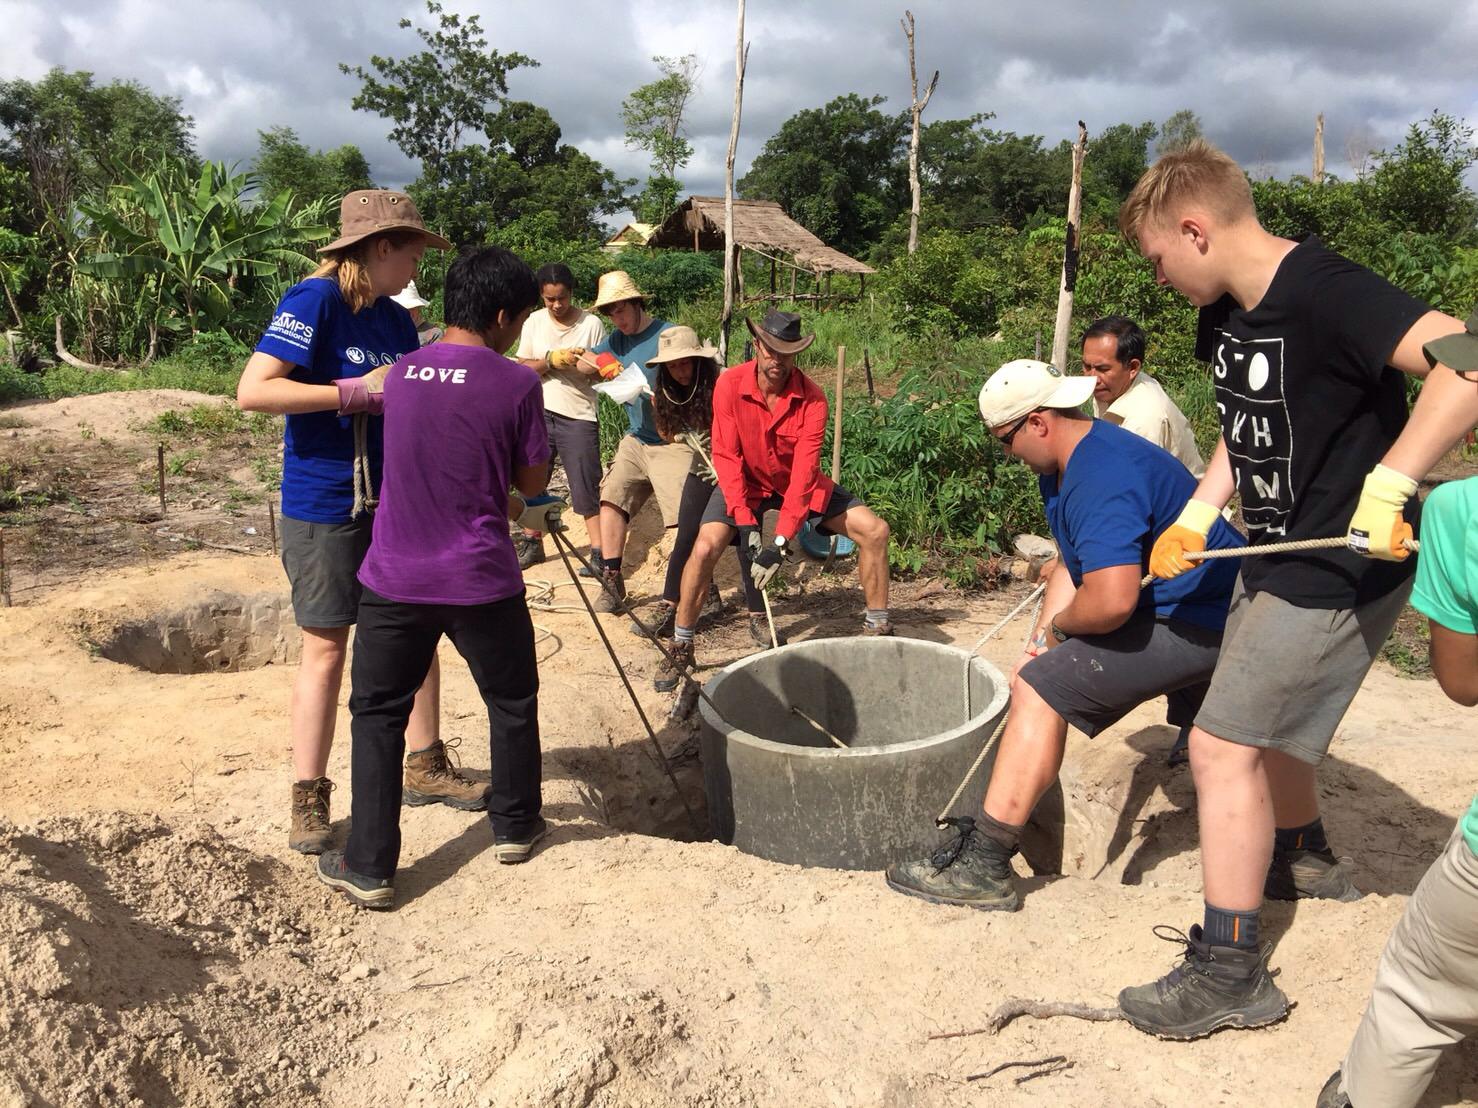 camps_international_healthcare_and_sanitation